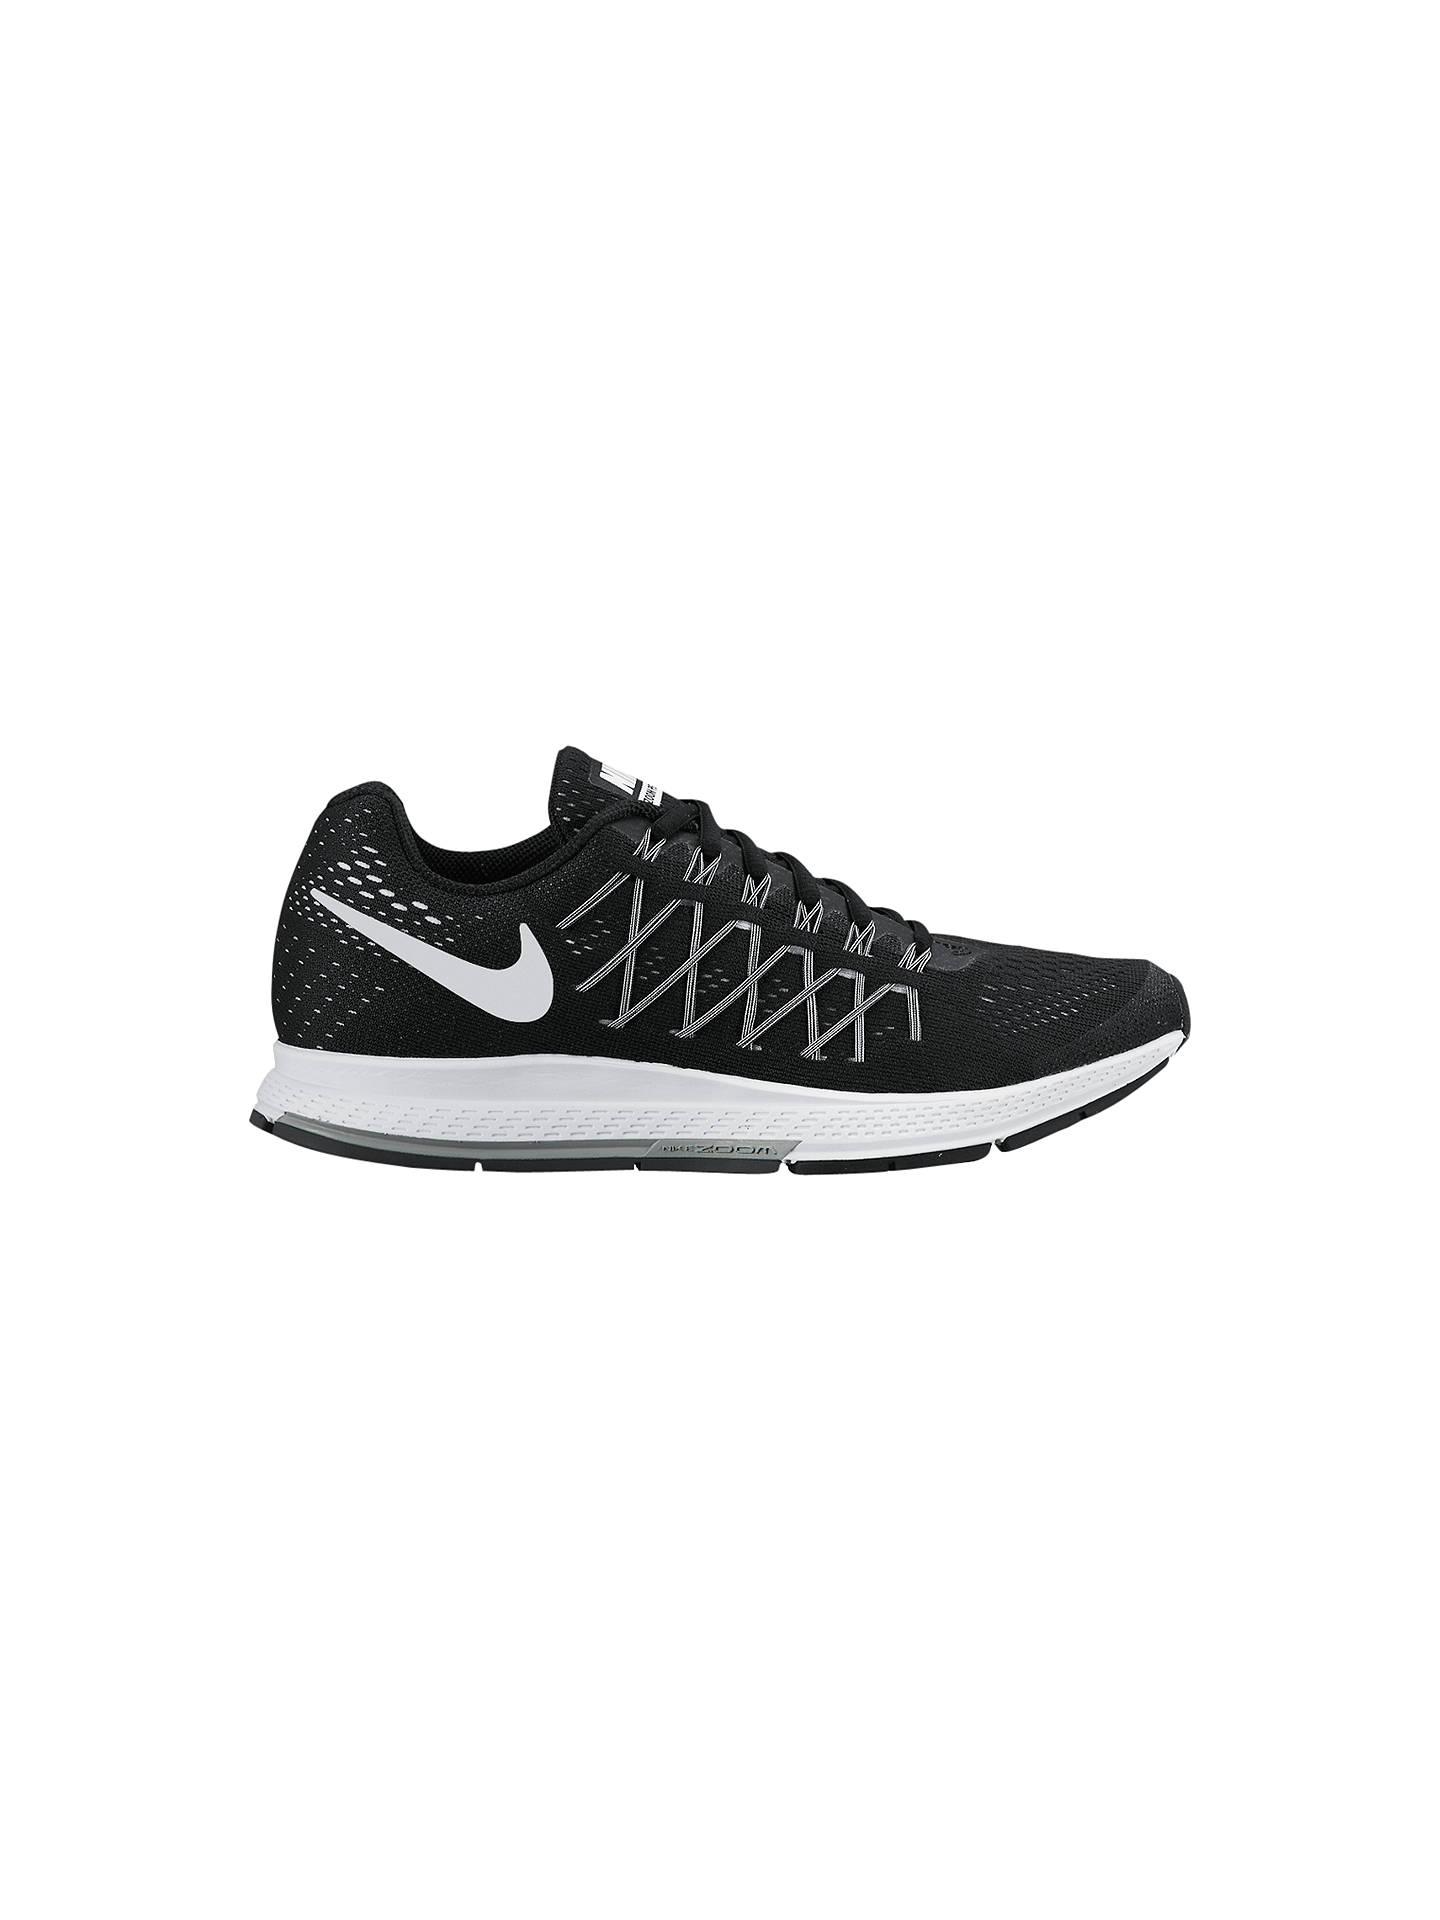 on sale 1e0da fa34b Nike Air Zoom Pegasus 32 Women's Running Shoes at John Lewis ...